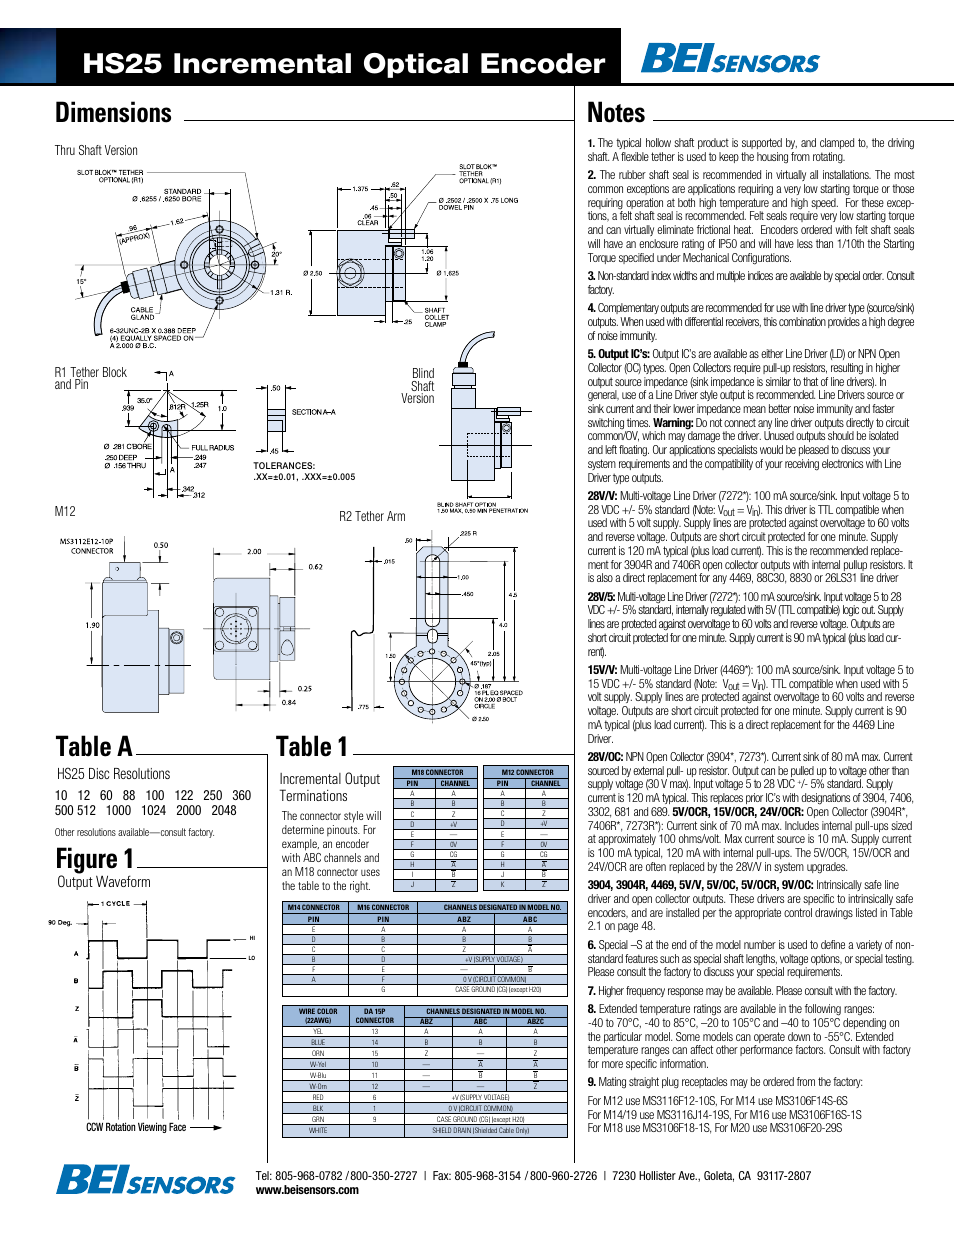 Hs25 Incremental Optical Encoder Output Waveform Disc Wiring Diagram Resolutions Terminations Blind